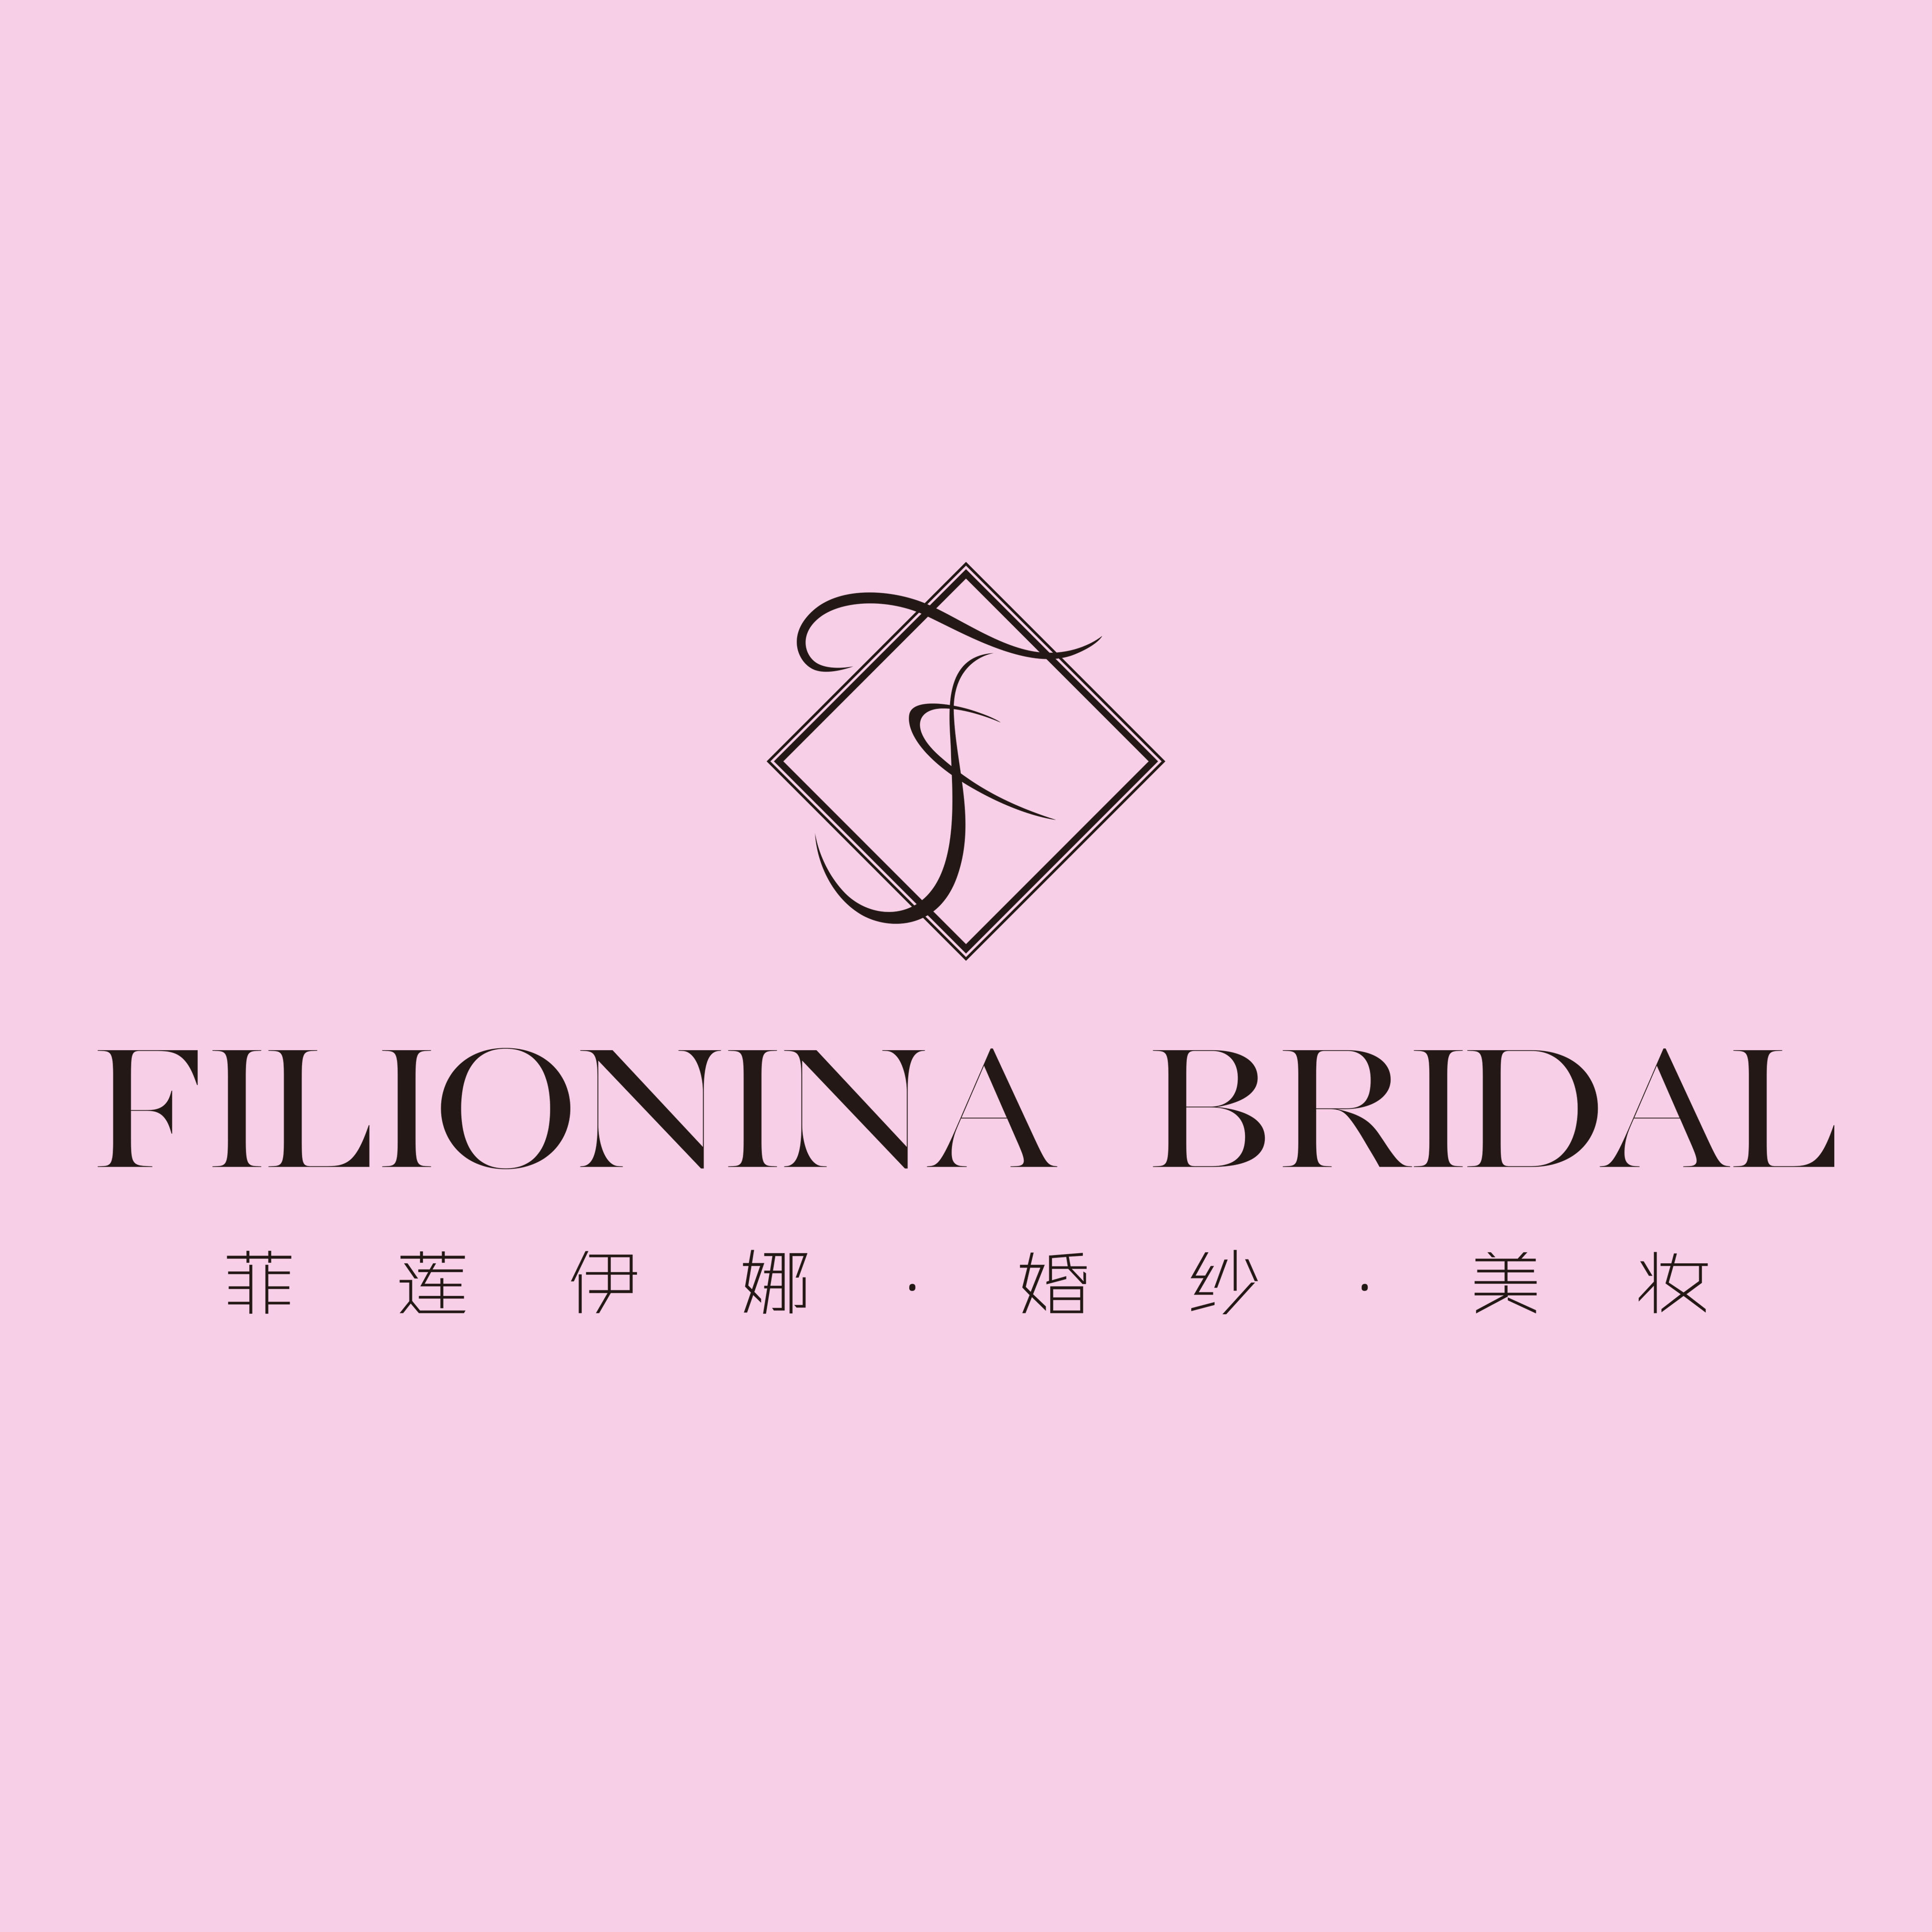 FilionIna婚纱礼服高级定制